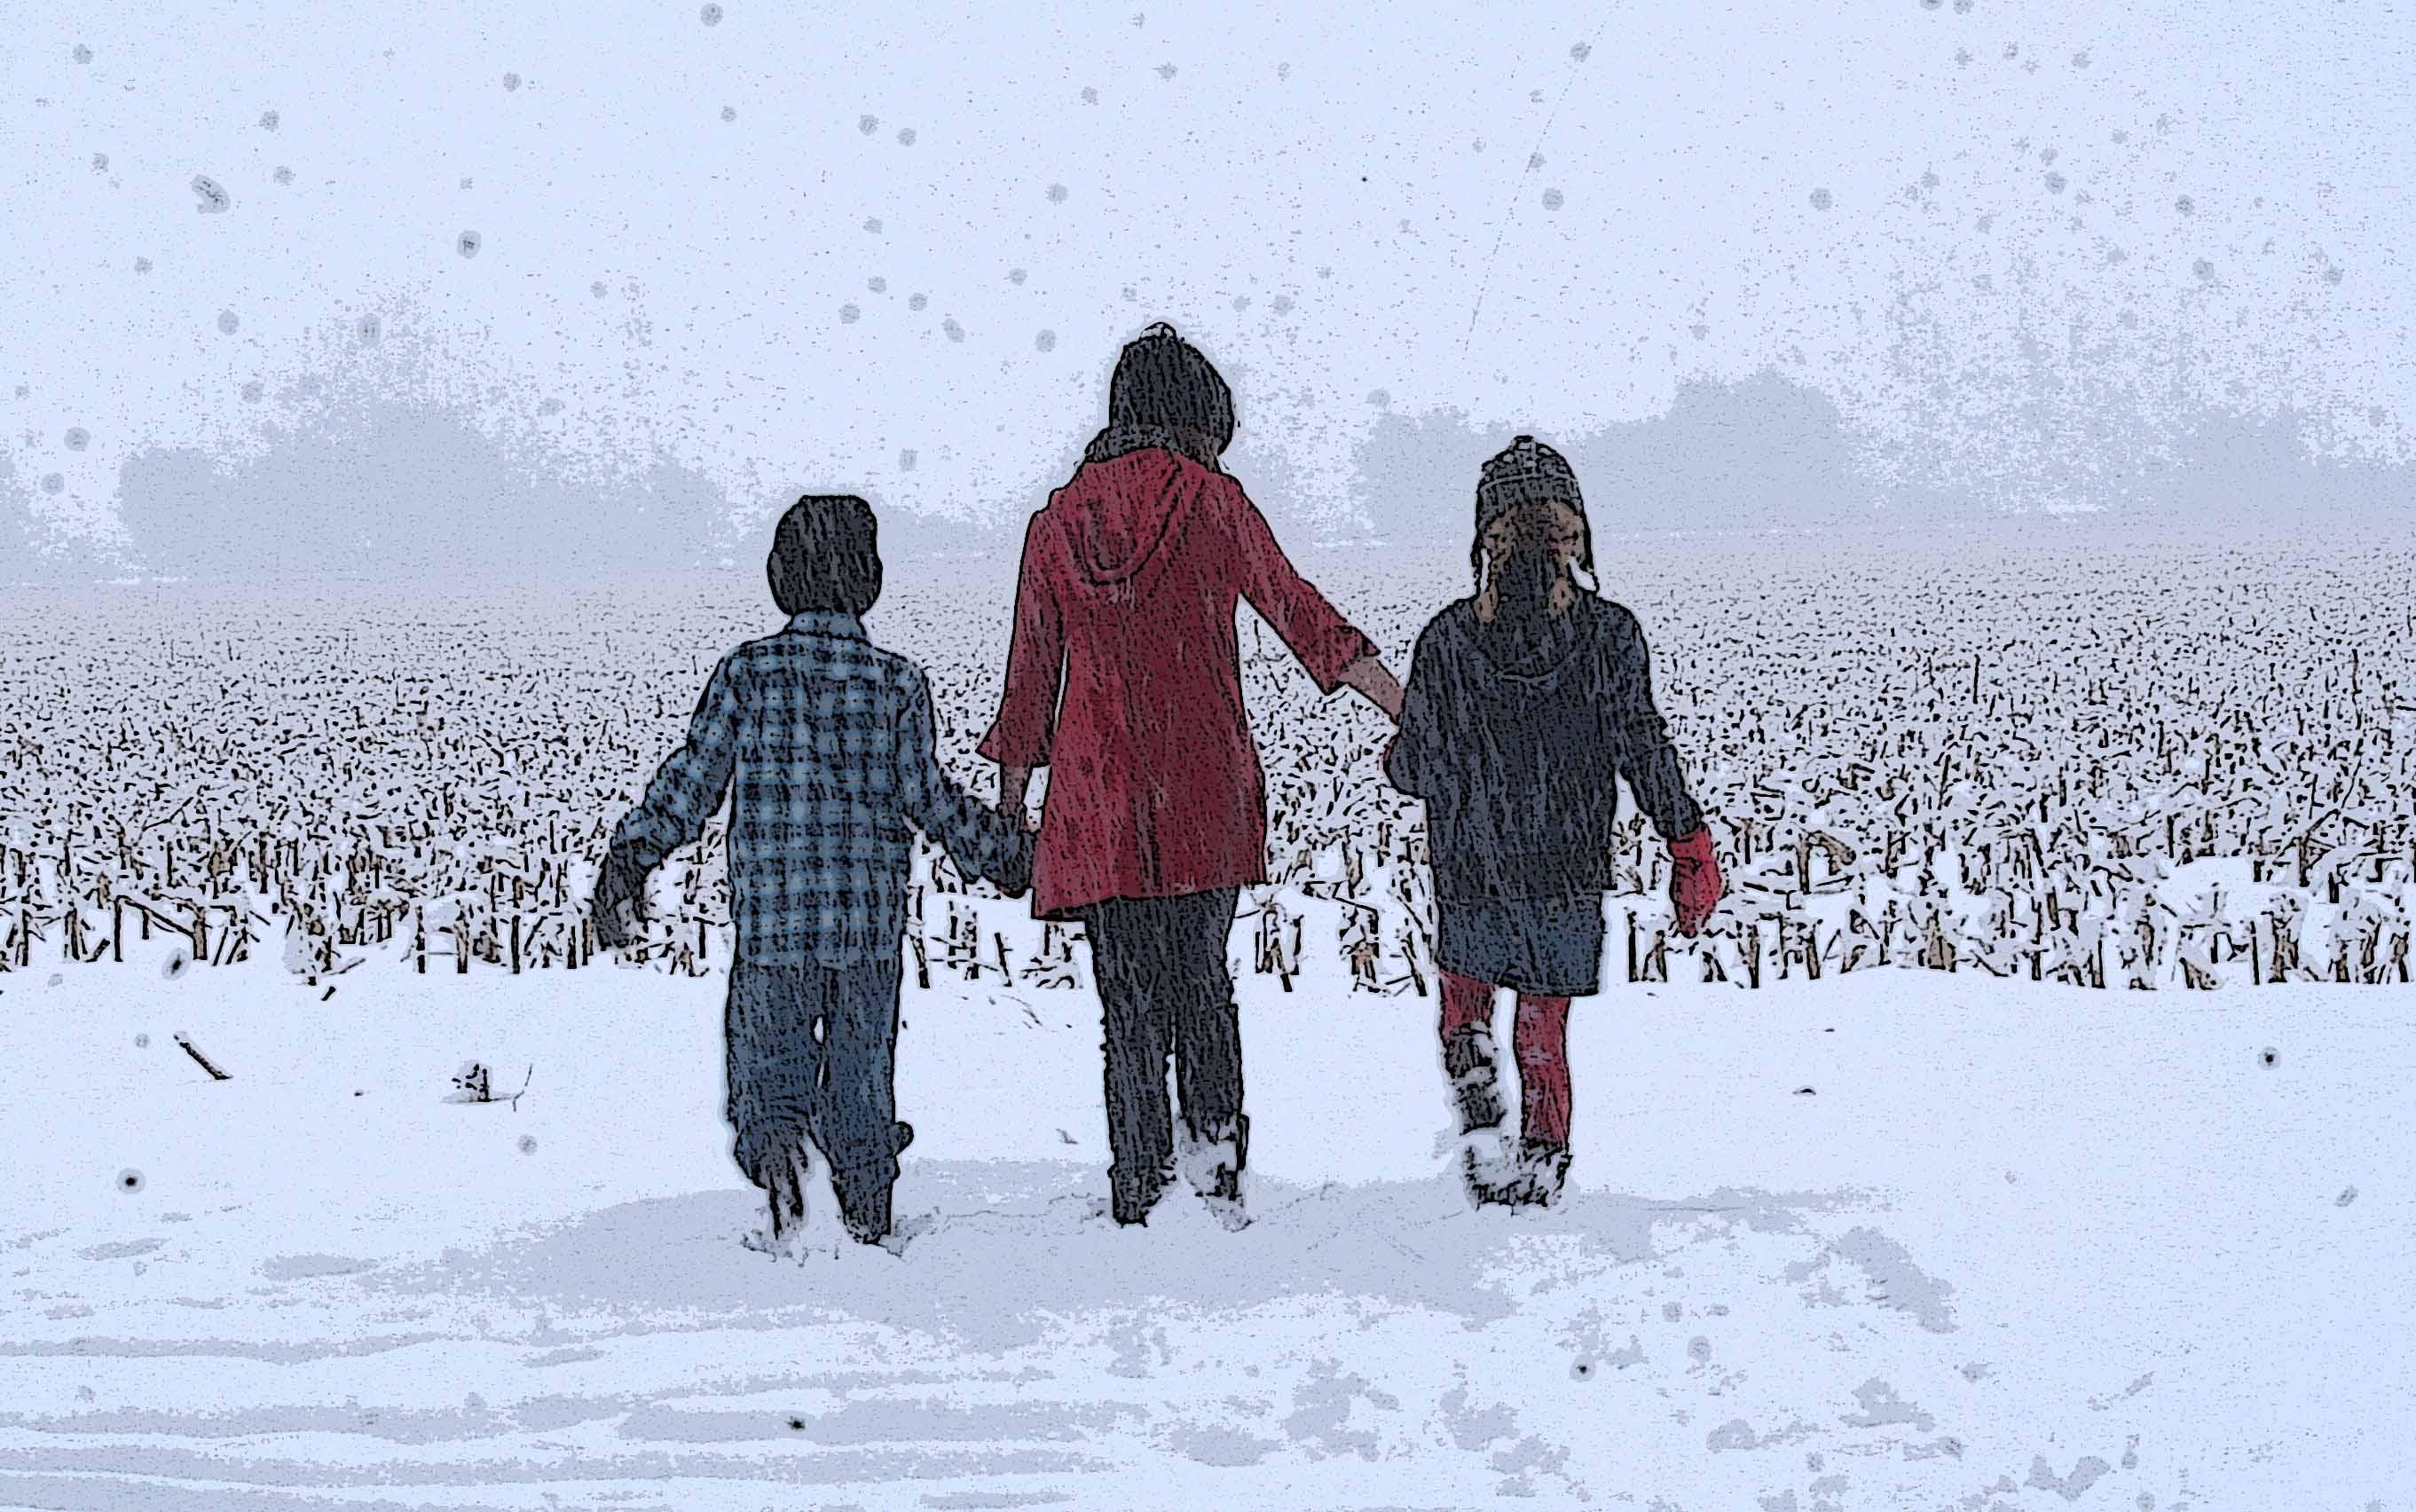 Barefoot In Snow   Sexy Wallpapers   Rainpowcom 2723x1704